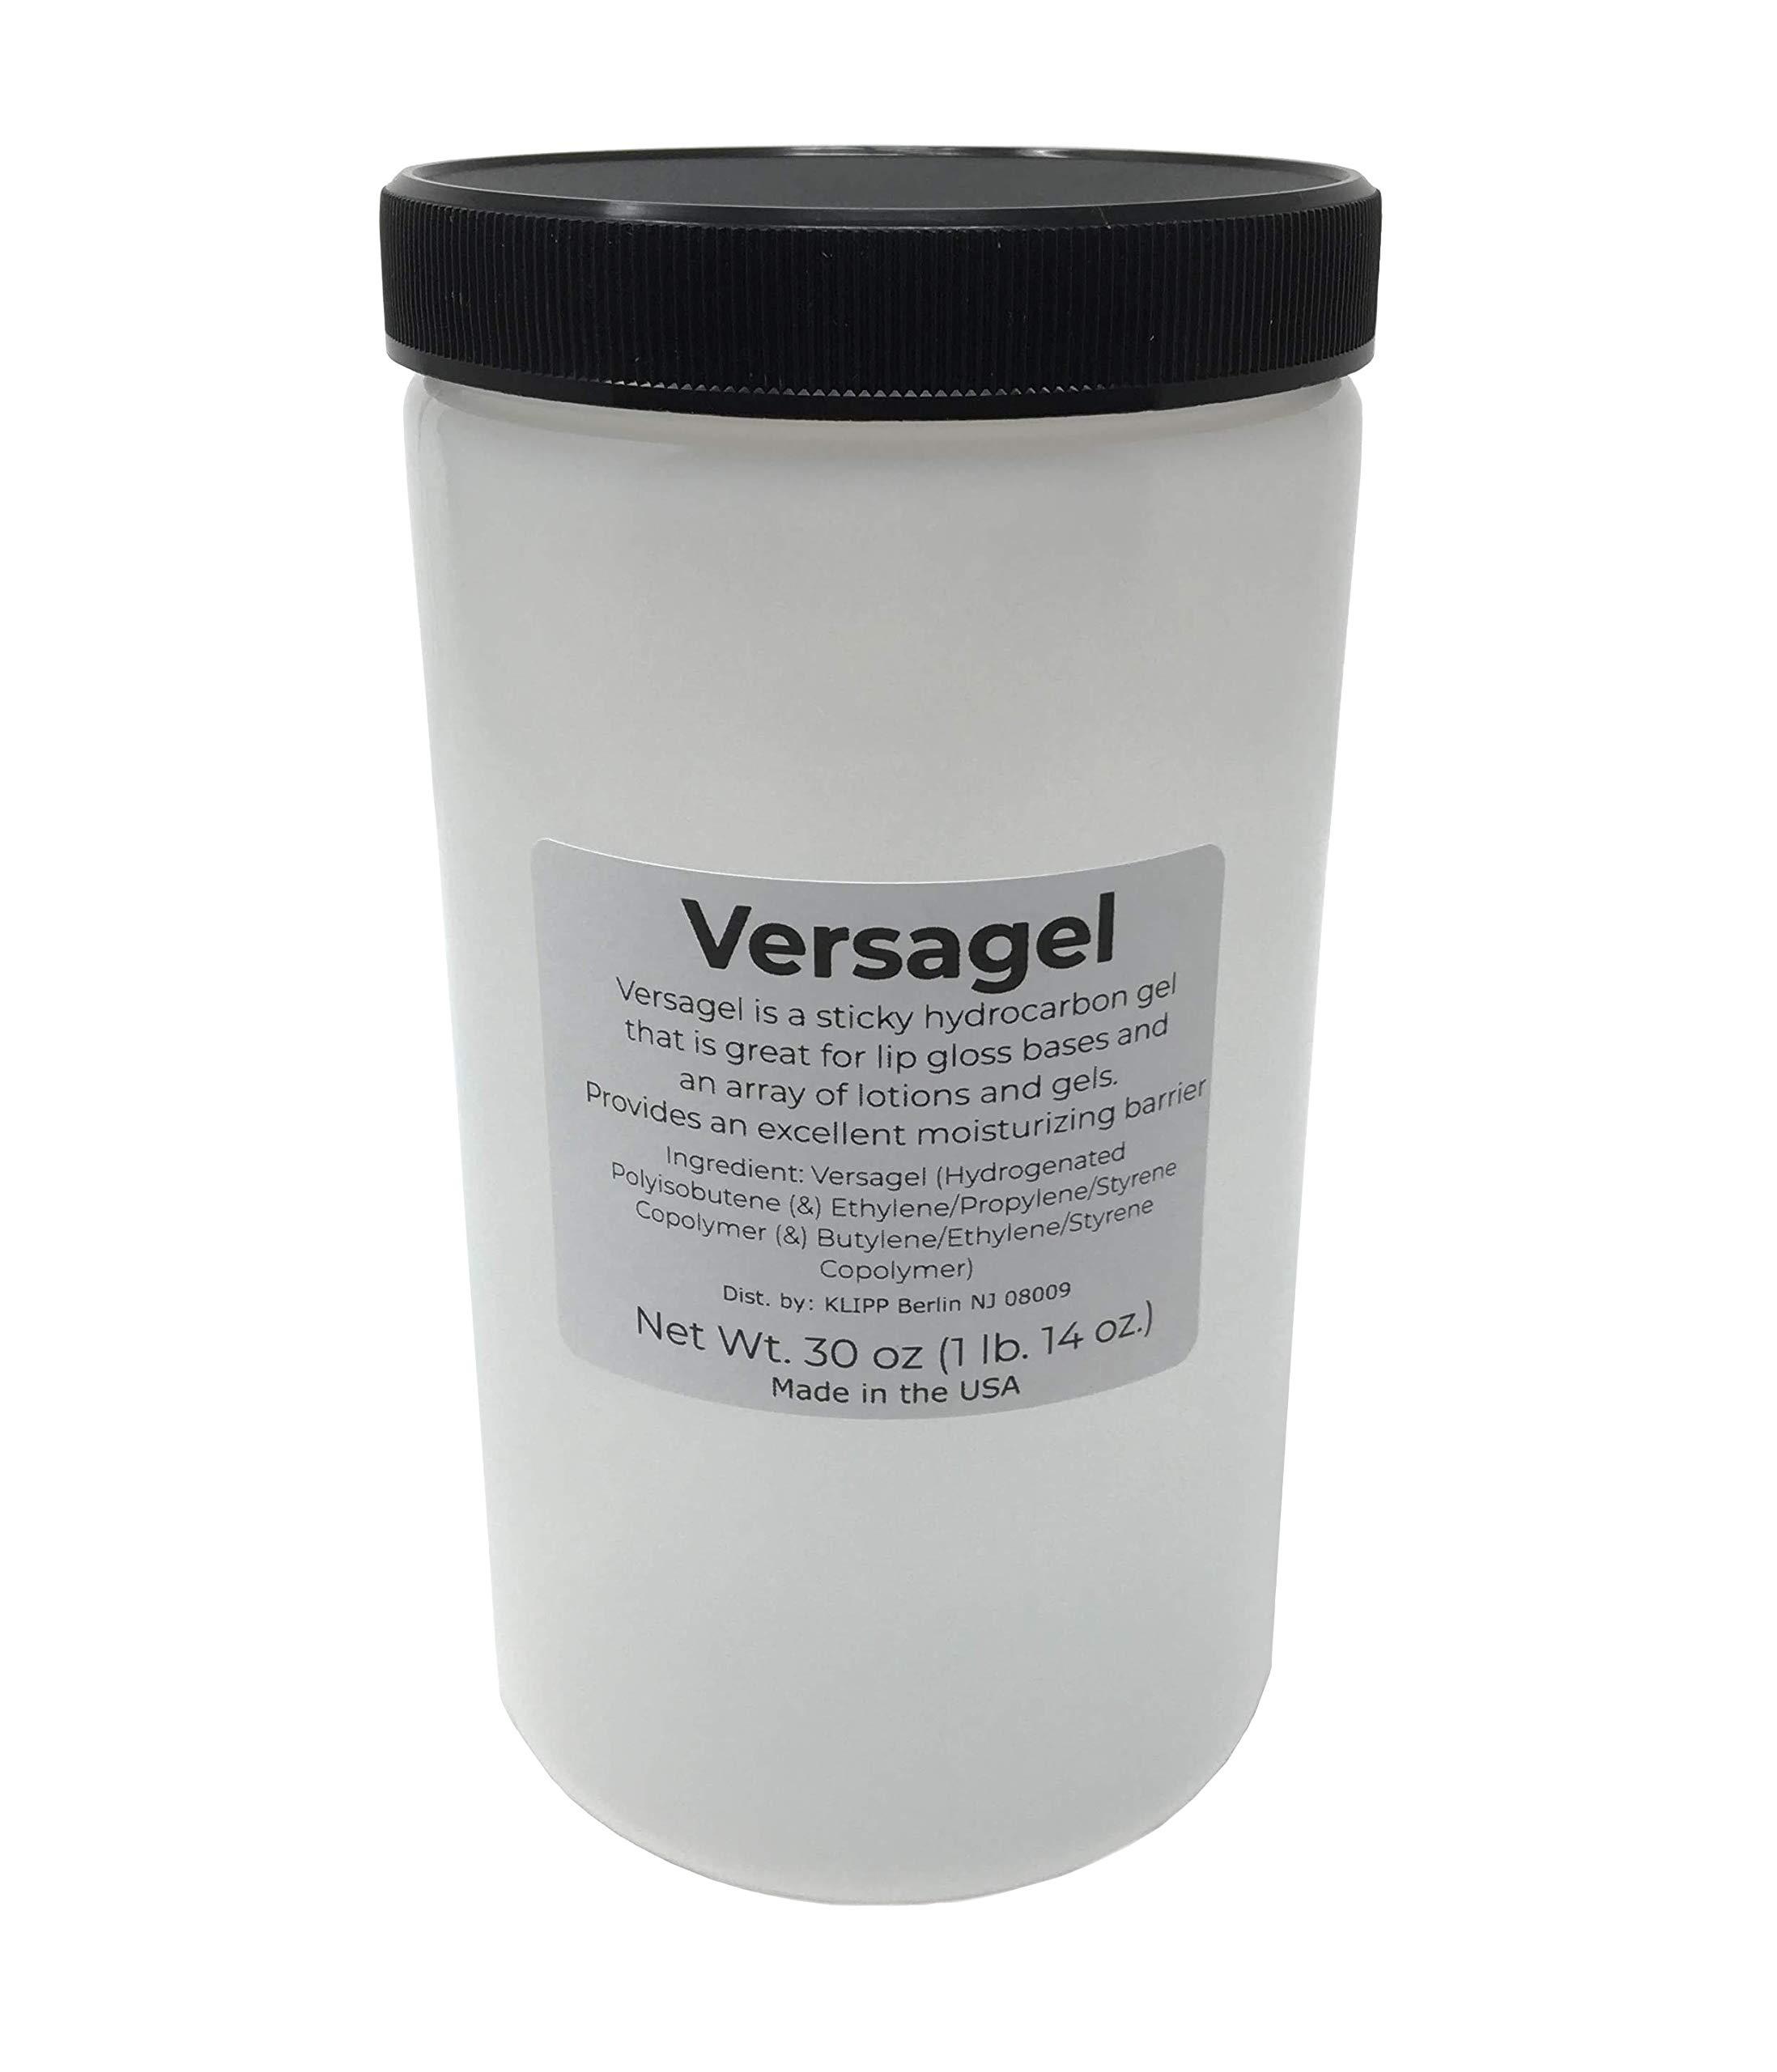 Versagel Lip Gloss Base (30 ounce (1lb 14oz) jar) by DIY Kit Creations.